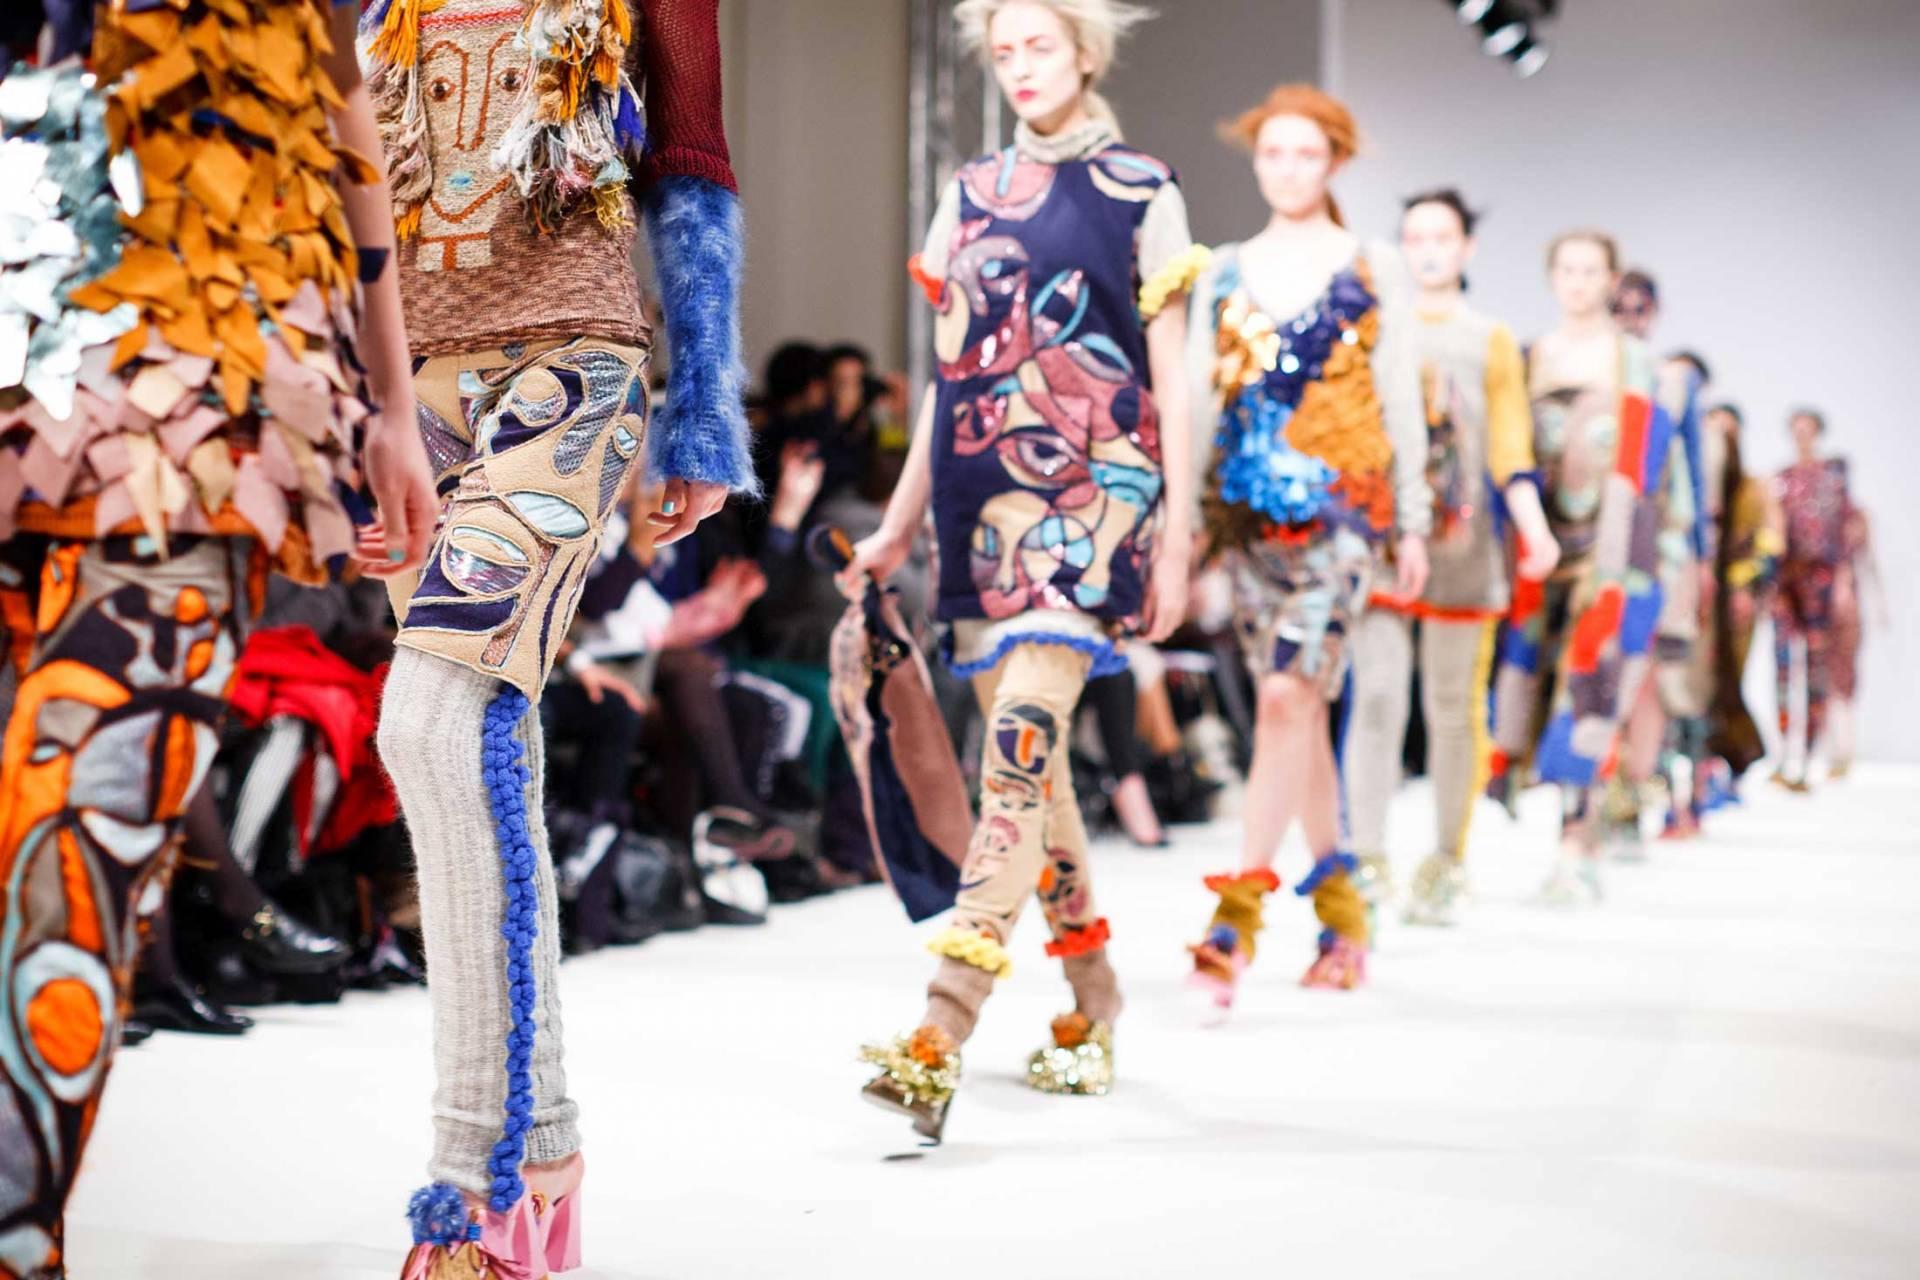 USFIA - United States Fashion Industry Association